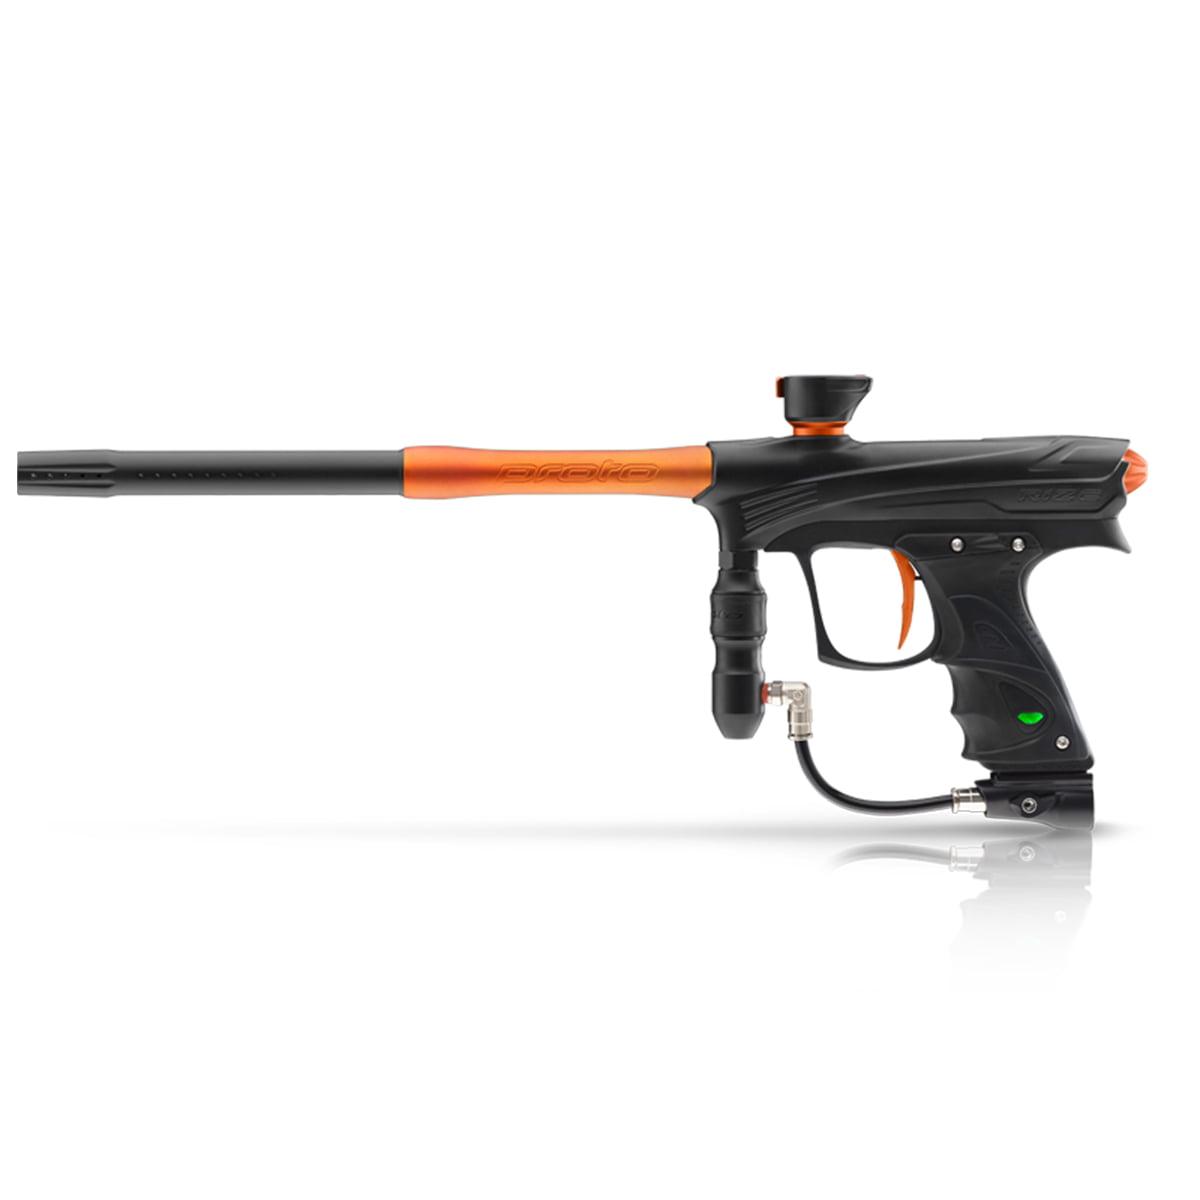 Proto Rize MaXXed Paintball Marker Black   Orange by Dye Precision